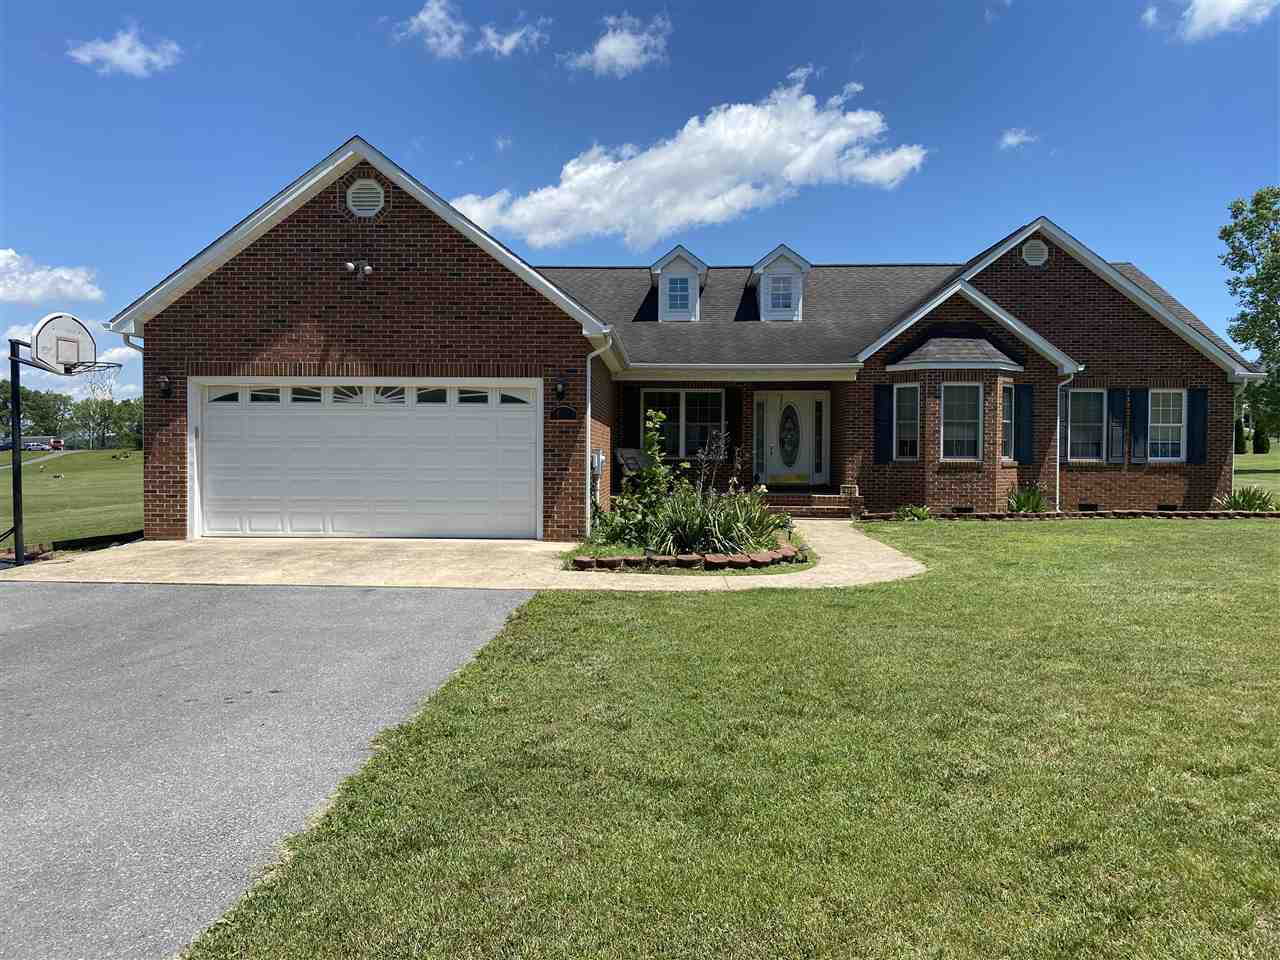 1707 MARKSVILLE RD, STANLEY, VA 22851